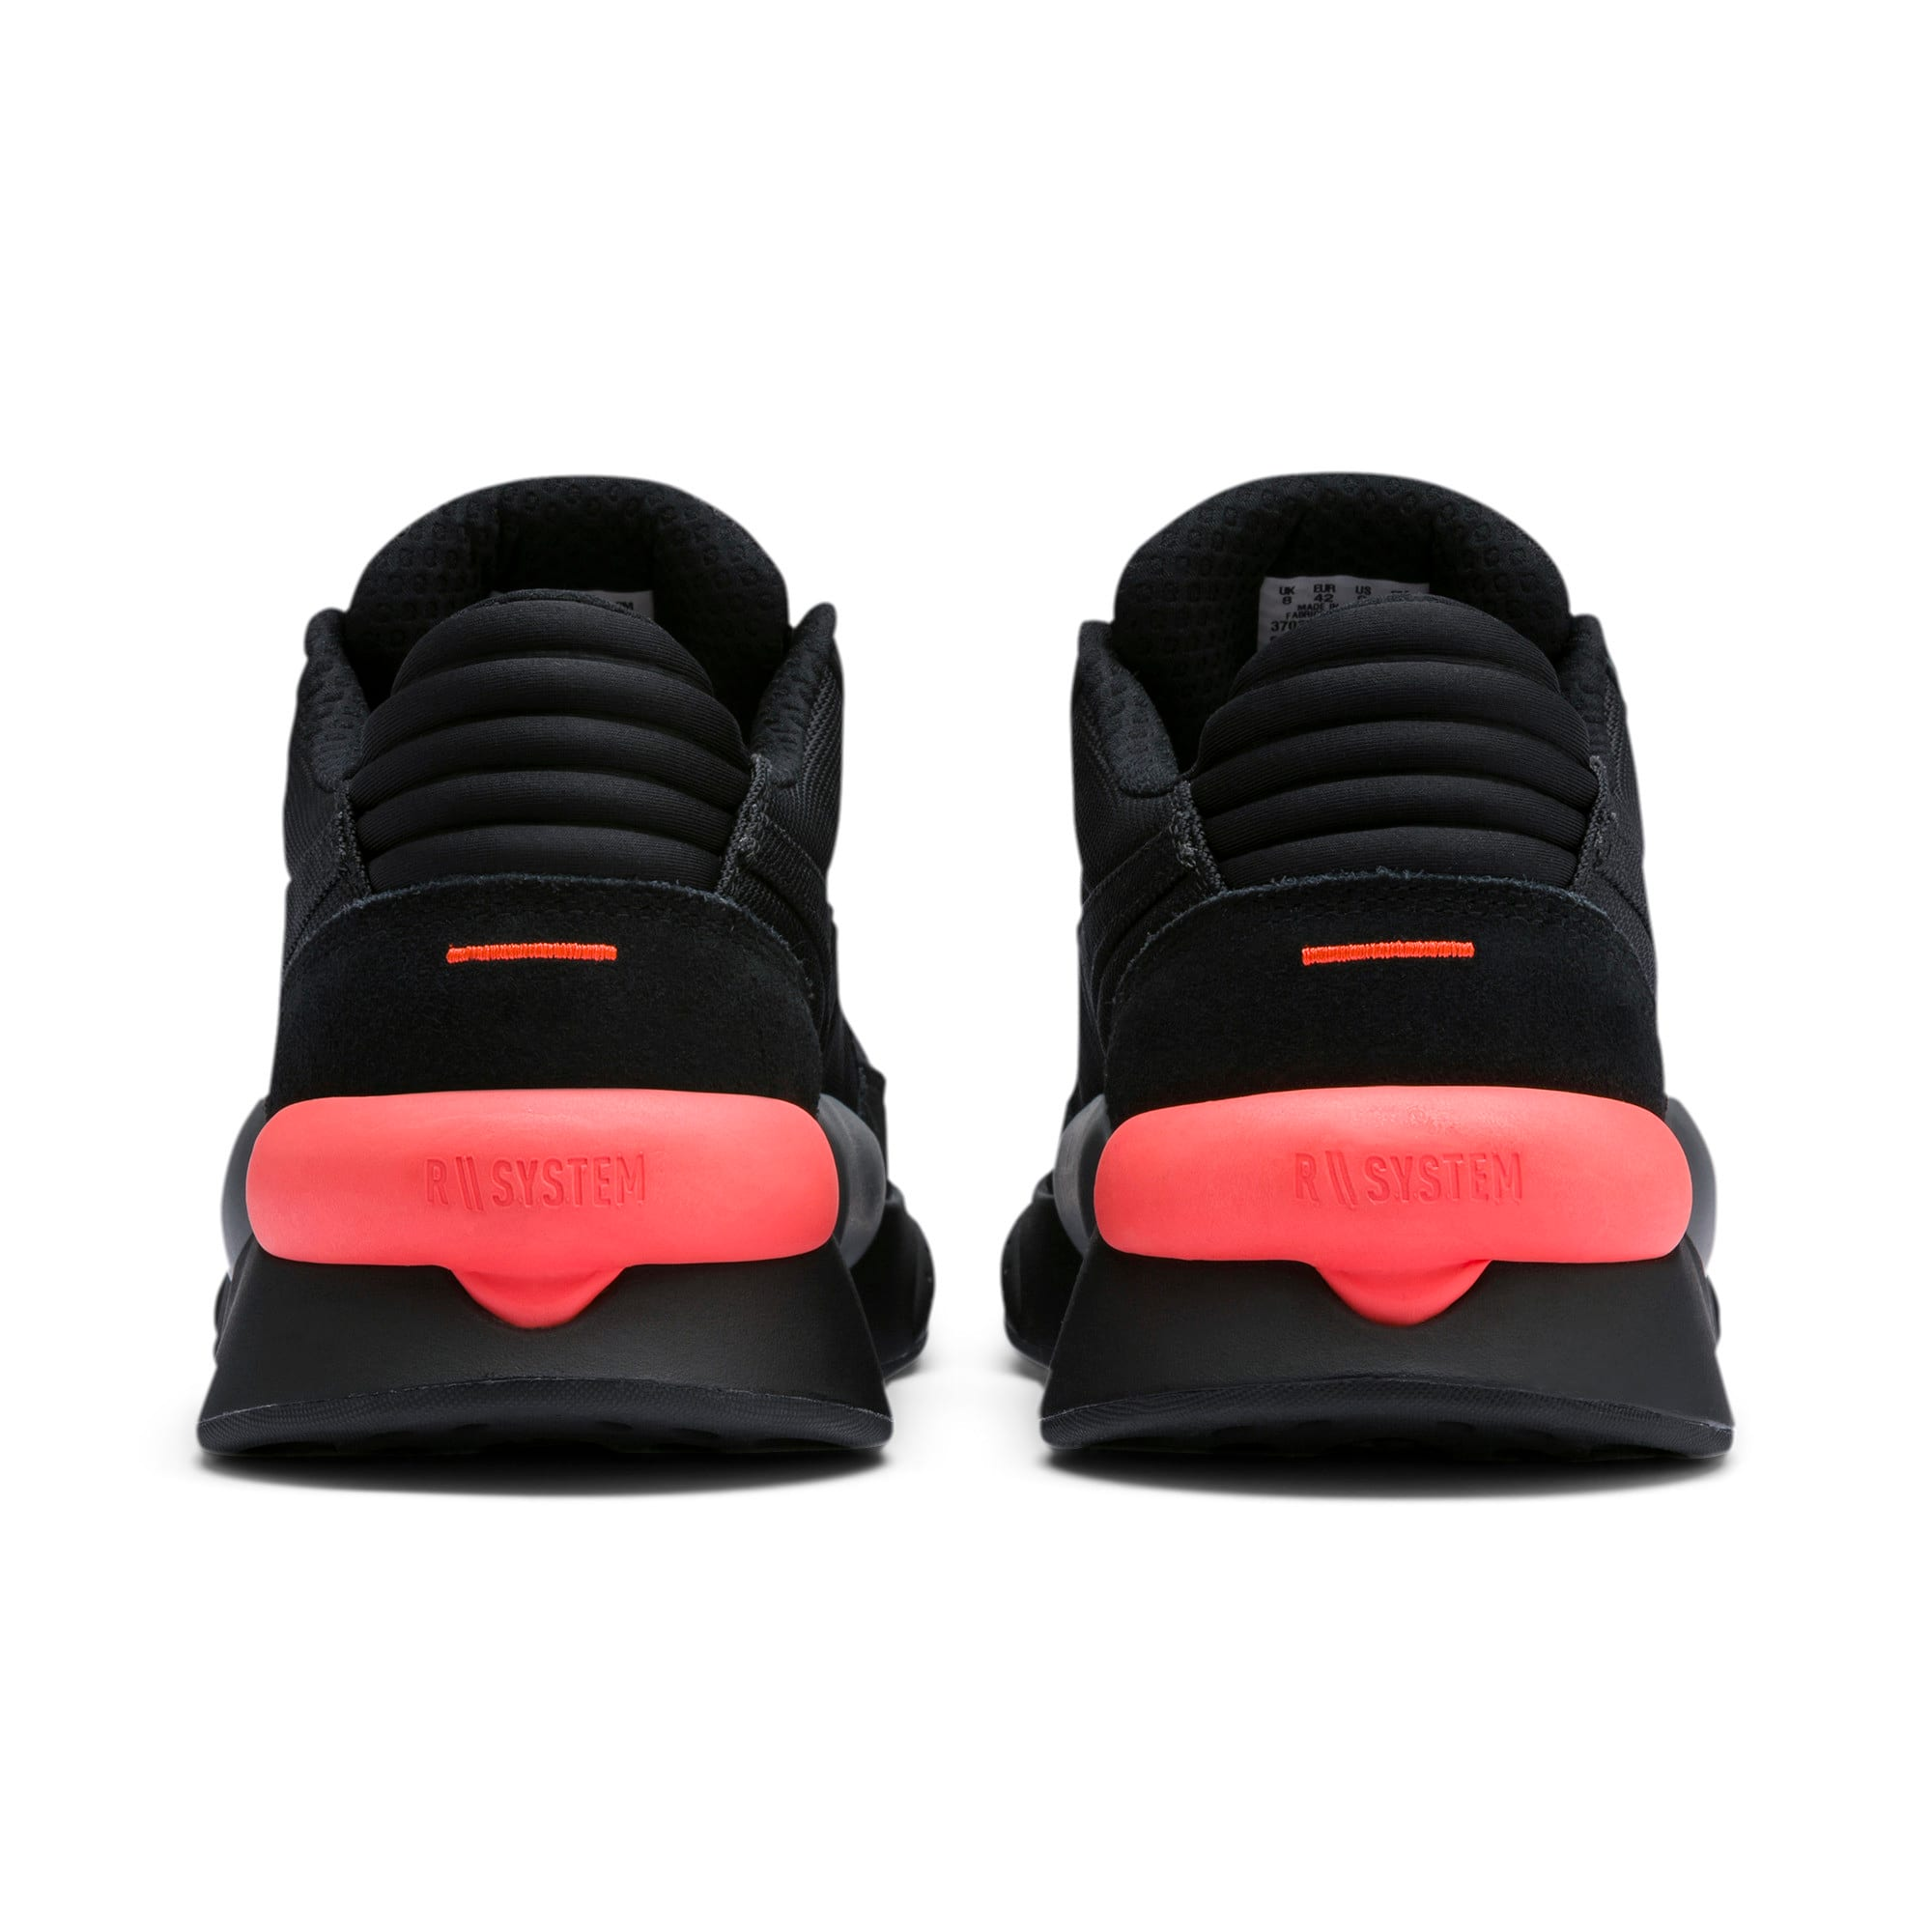 Thumbnail 3 of RS 9.8 Cosmic Sneakers, Puma Black, medium